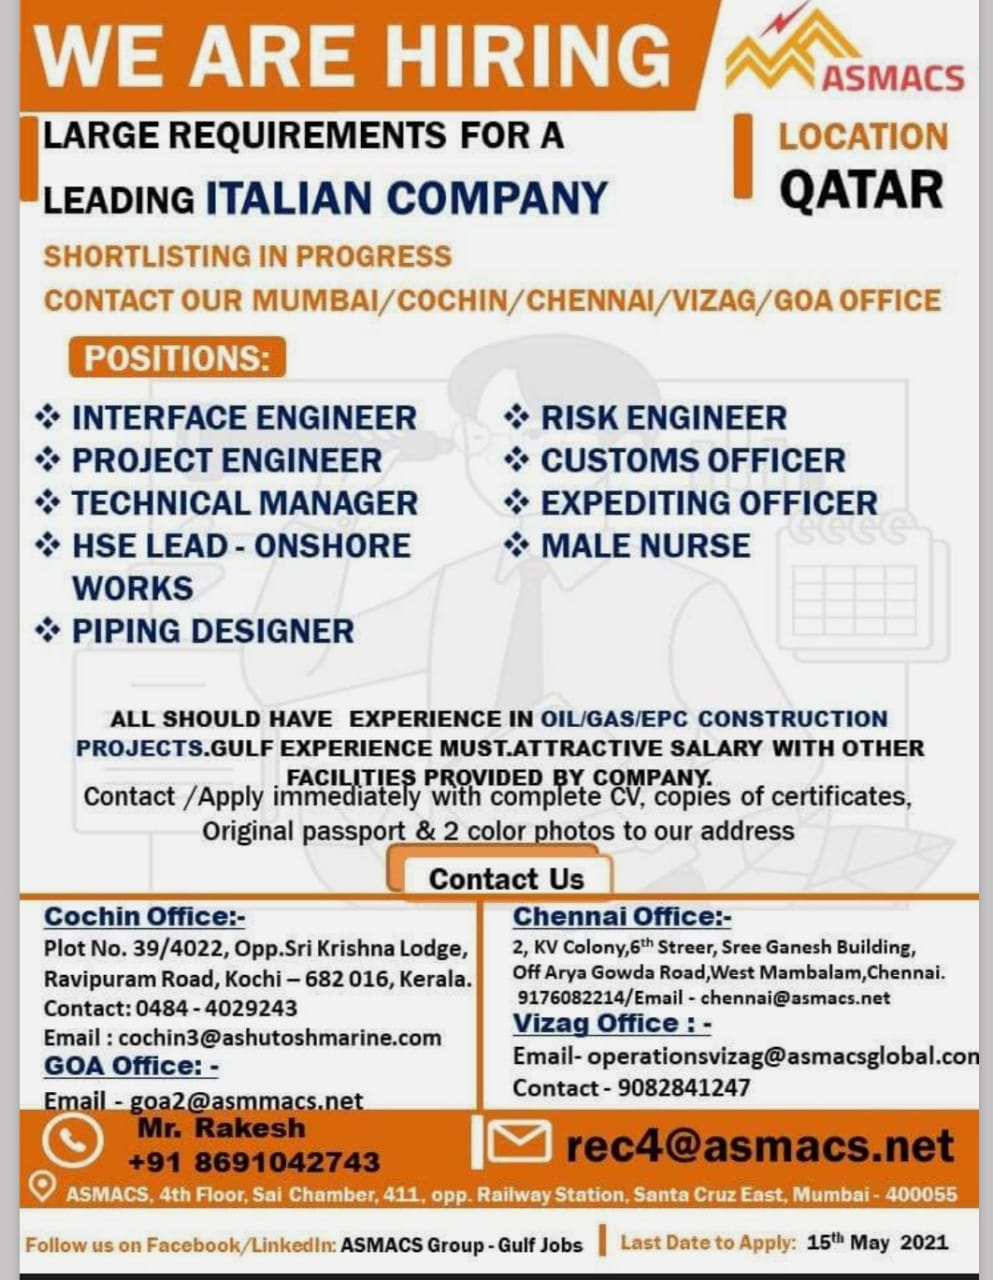 WALK IN INTERVIEWS AT MUMBAI FOR QATAR ITALIAN COMPANY